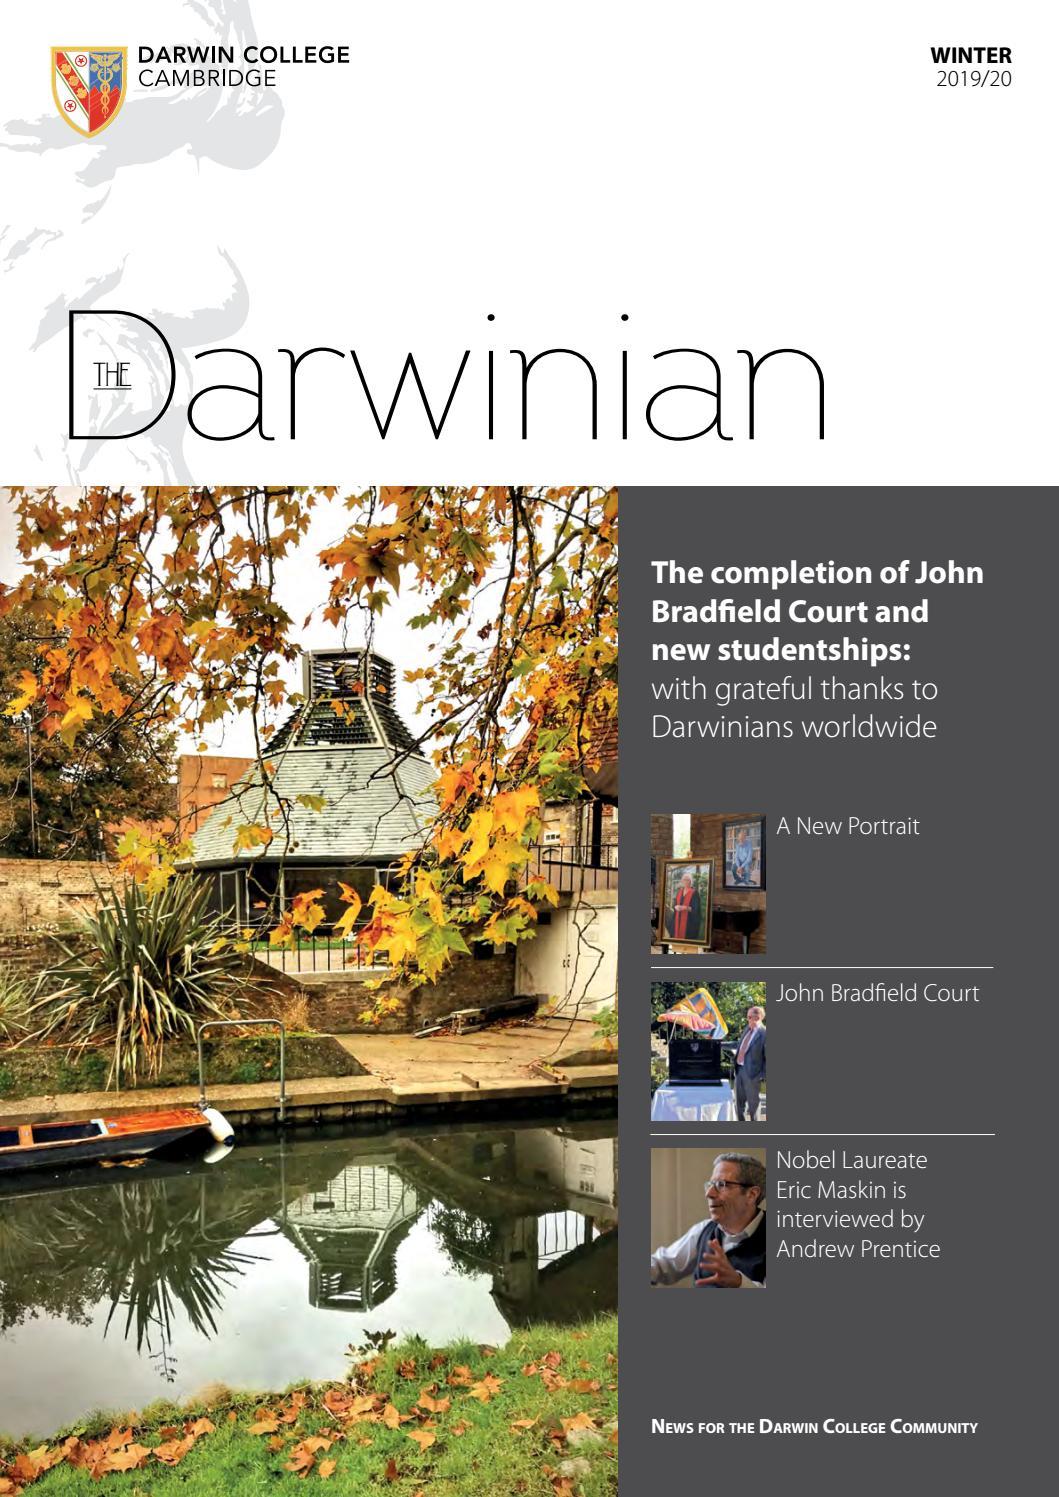 Transformation Grange En Habitation Rt 2012 darwinian autumn/winter 2019darwin college, cambridge